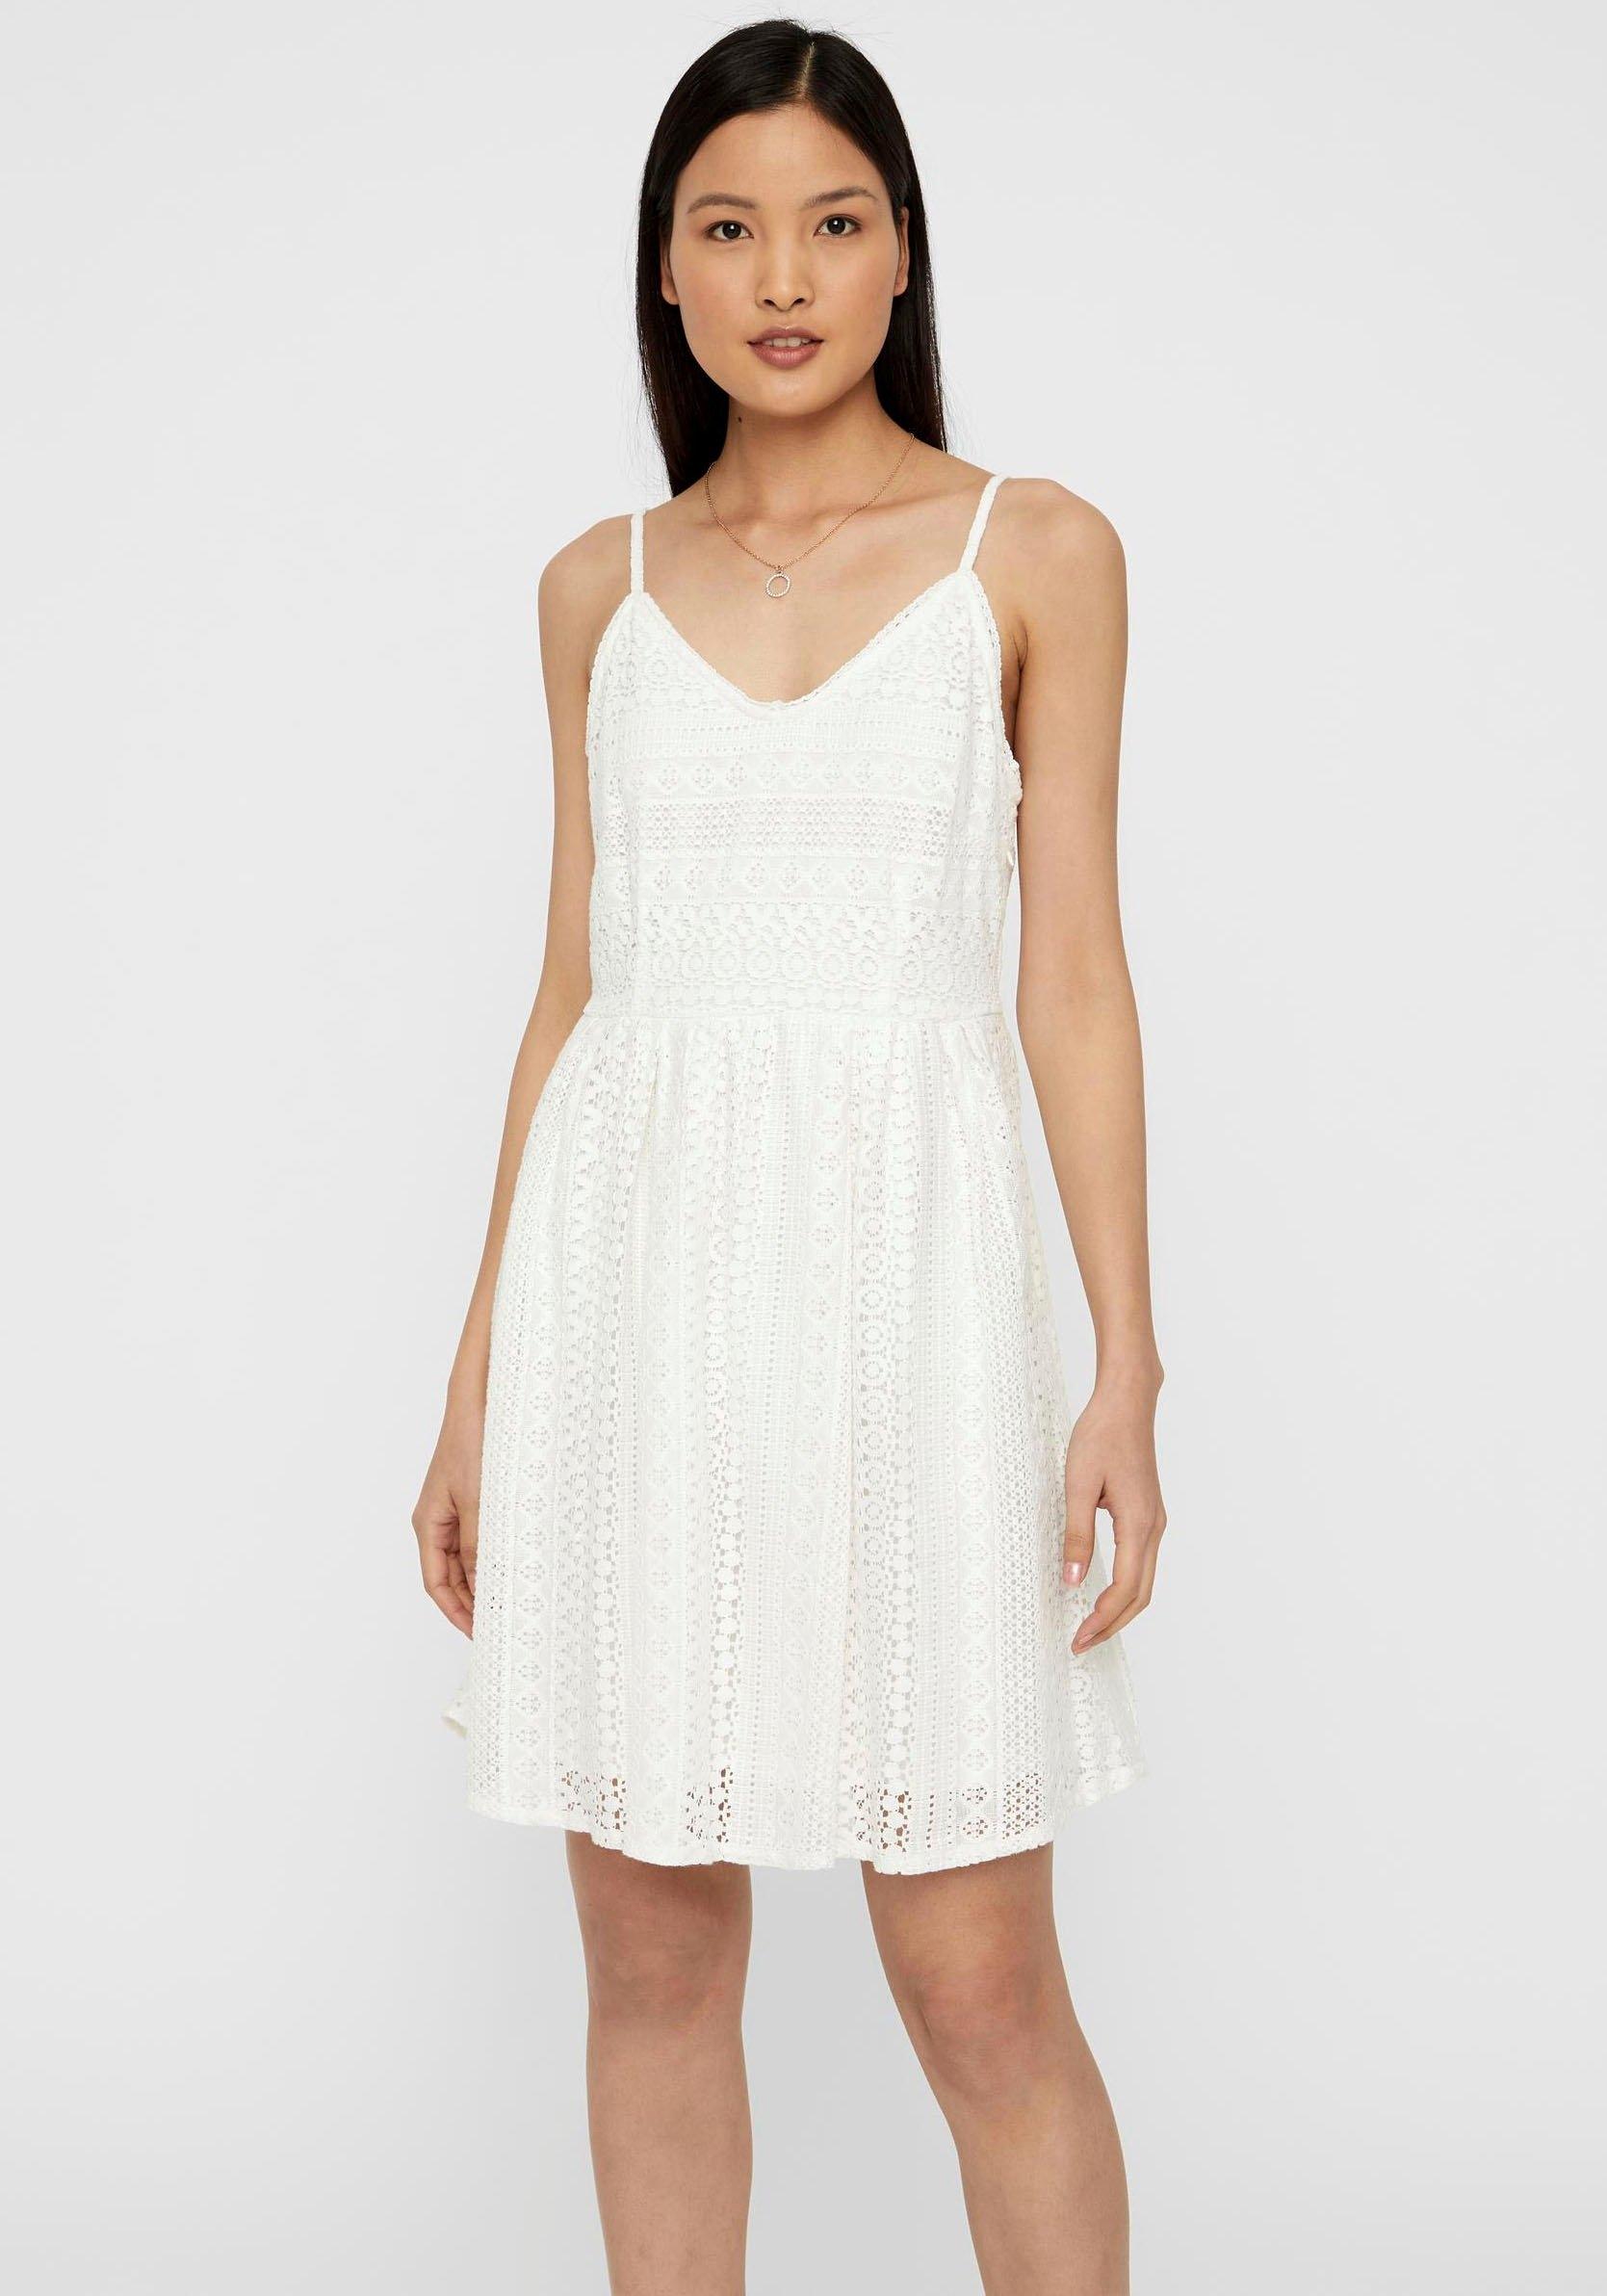 Vero Moda kanten jurk VMHONEY LACE bij OTTO online kopen